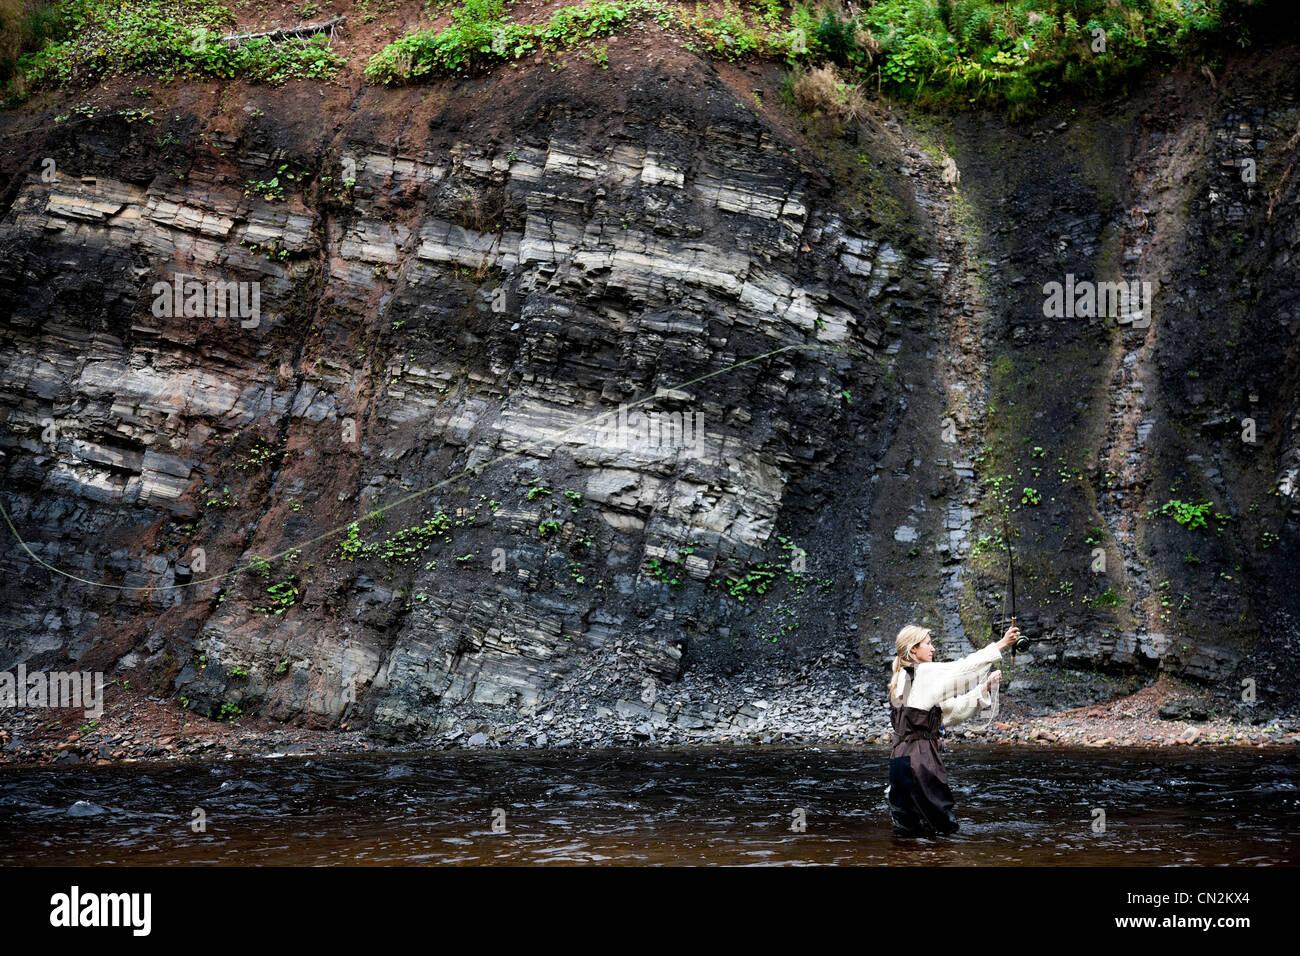 Female fly fisher in Margaree River, Cape Breton Island, Nova Scotia - Stock Image